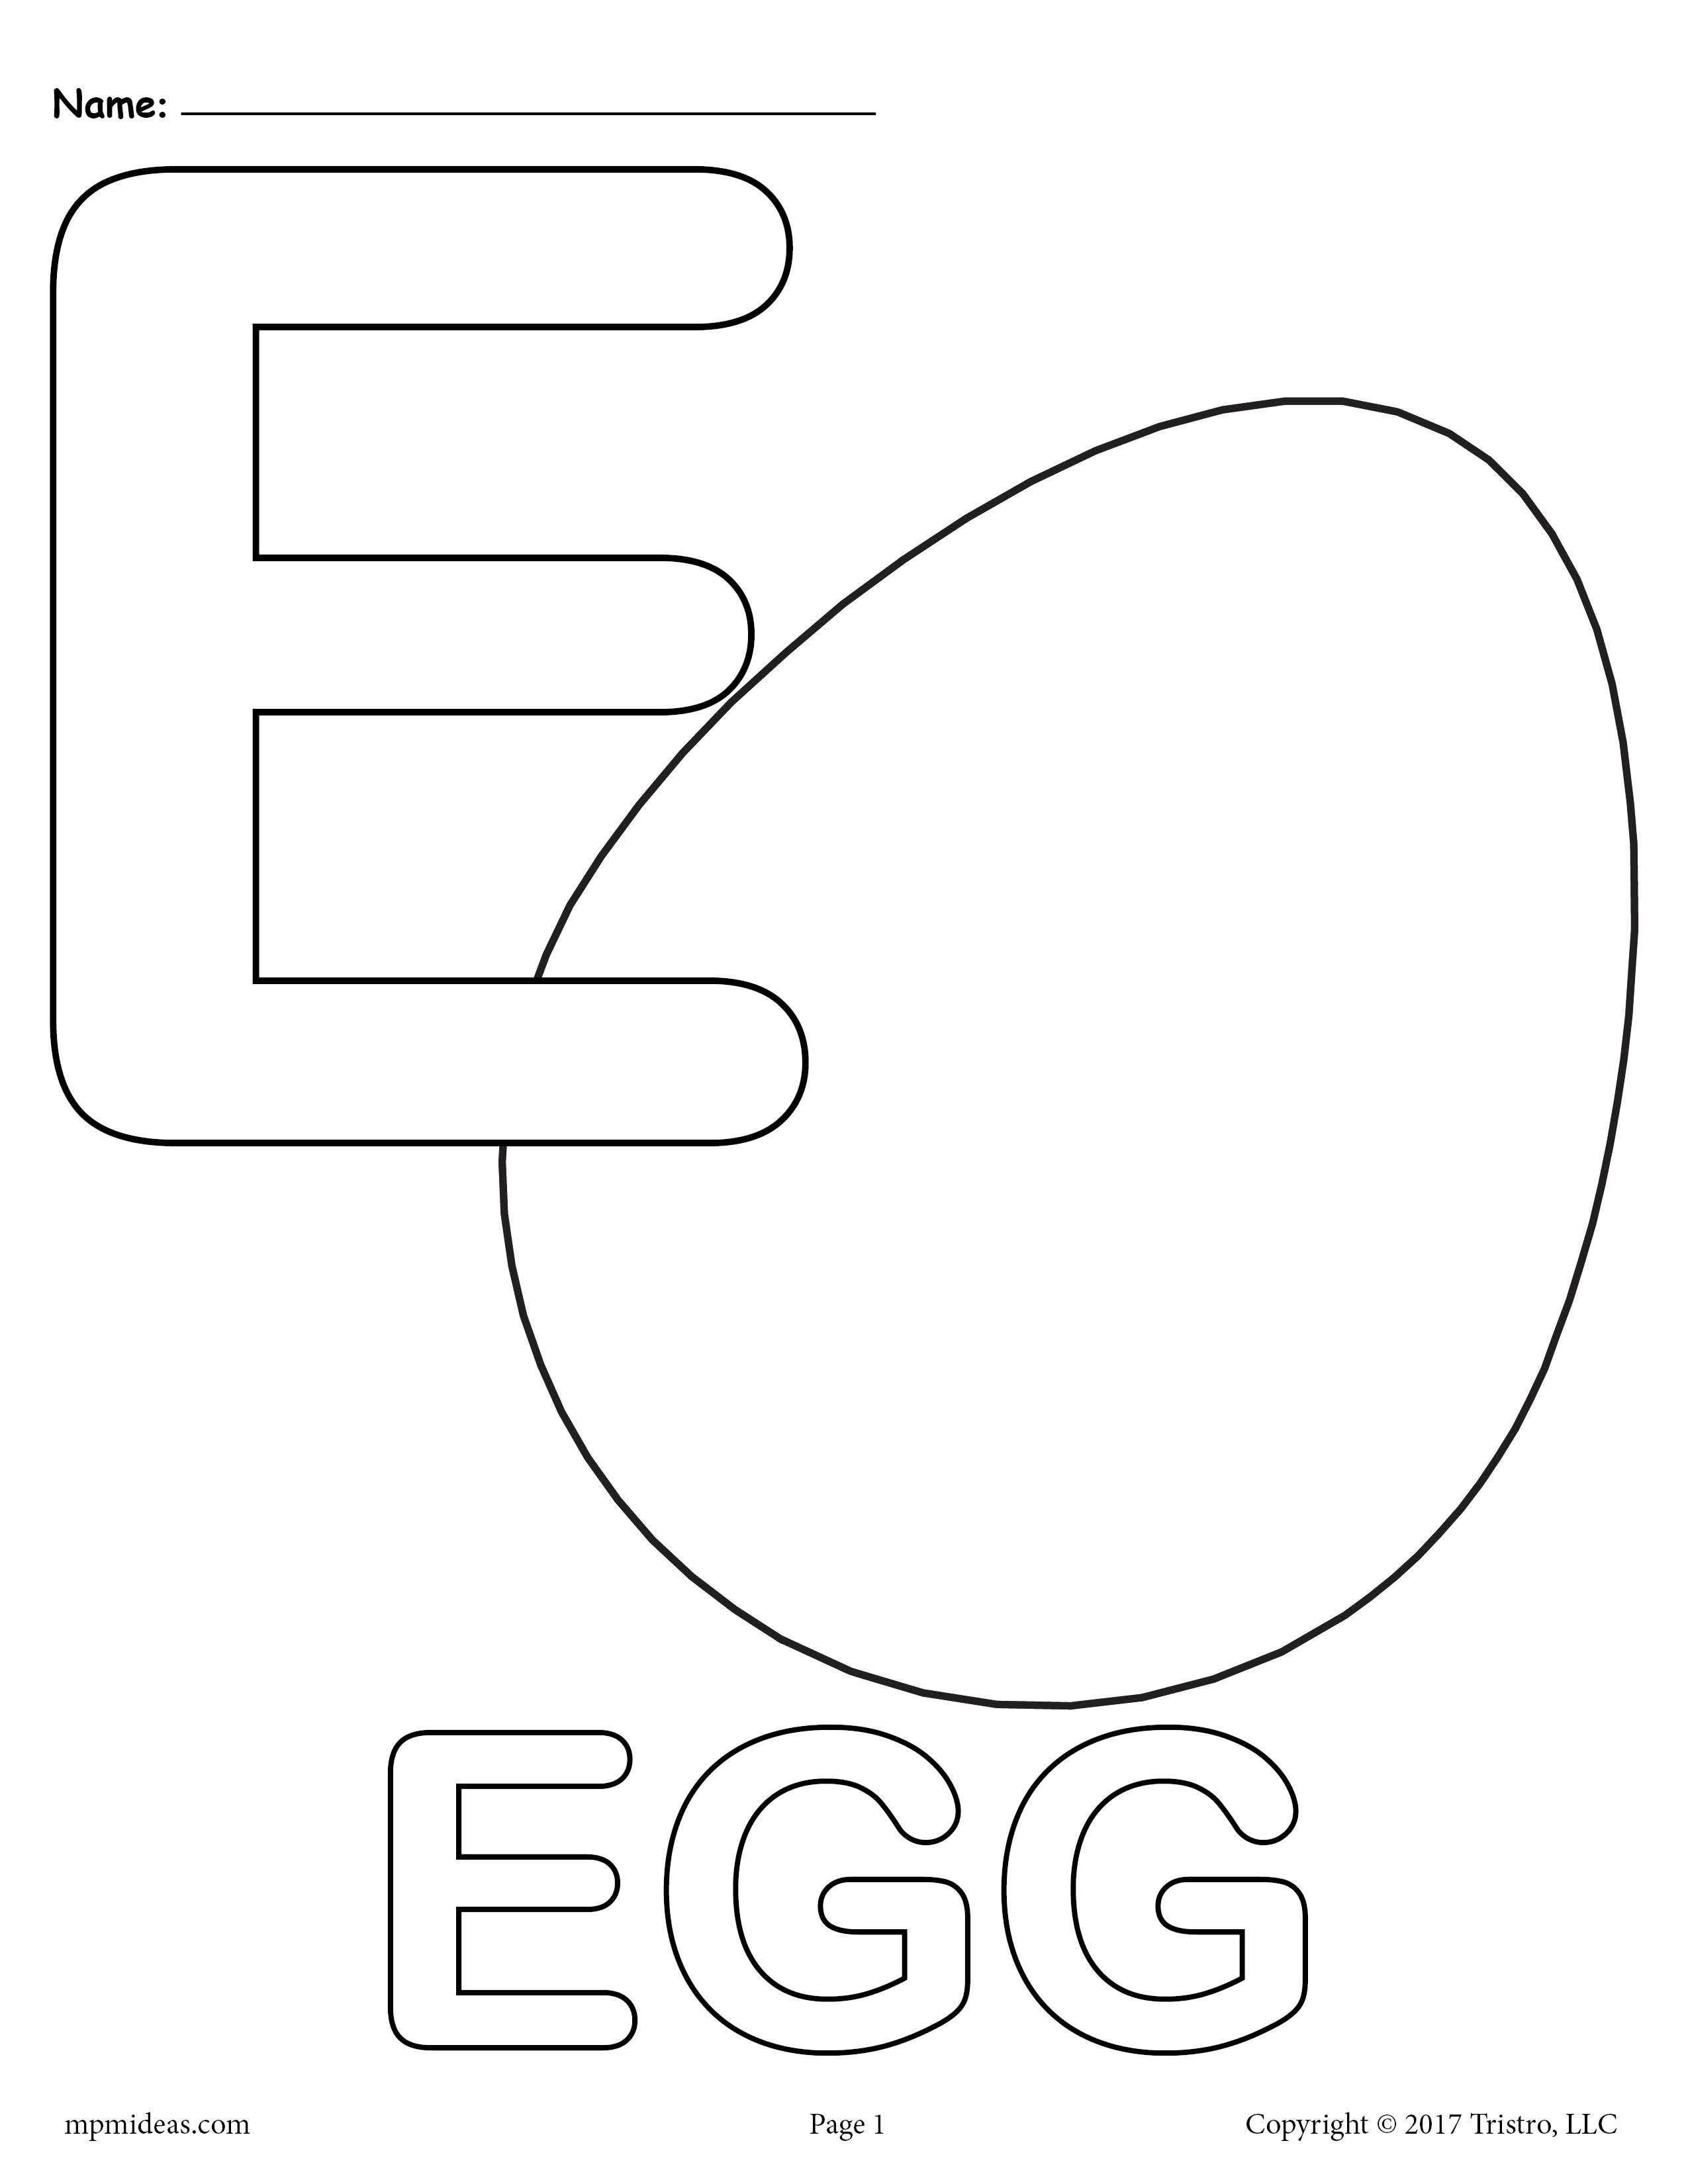 Letter E Alphabet Coloring Pages 3 Printable Versions Alphabet Coloring Pages Alphabet Coloring Letter E Worksheets [ 3300 x 2550 Pixel ]